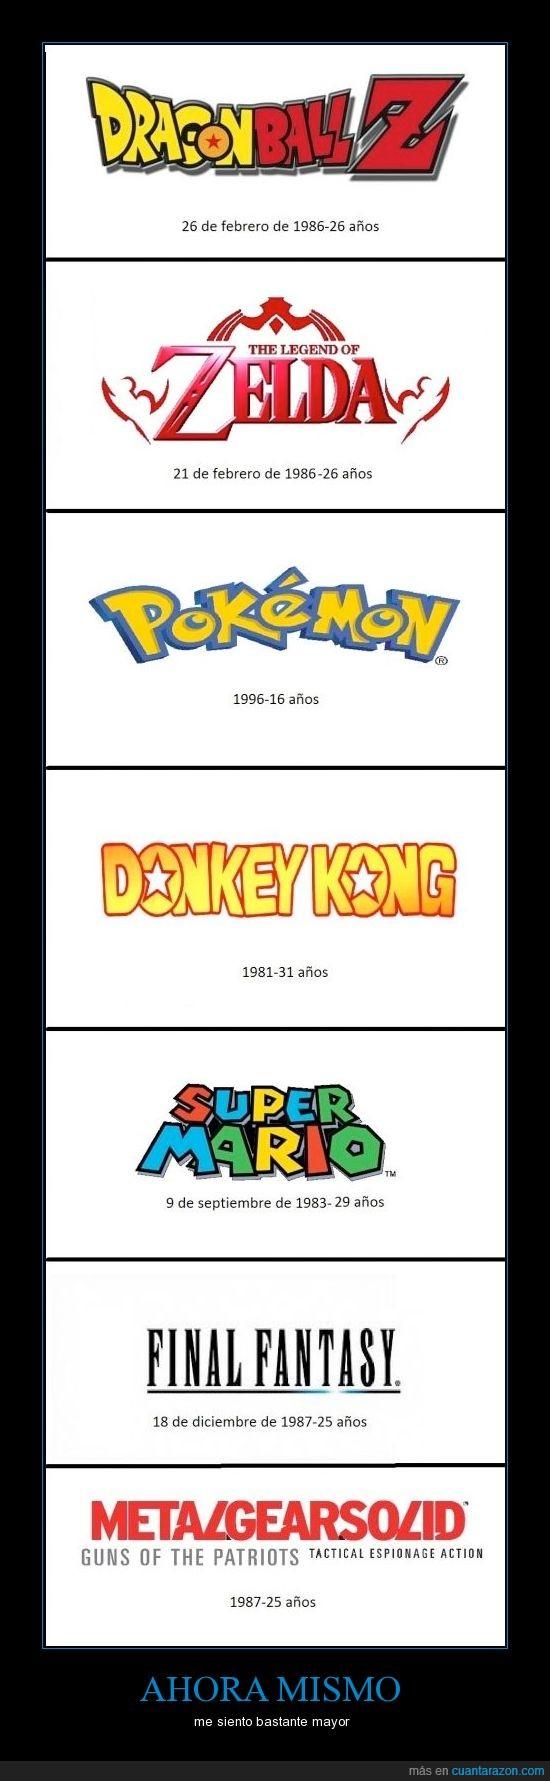 donkey kong,final fantasy,mario,mgs,pokémondbz,sagas épicas,zelda